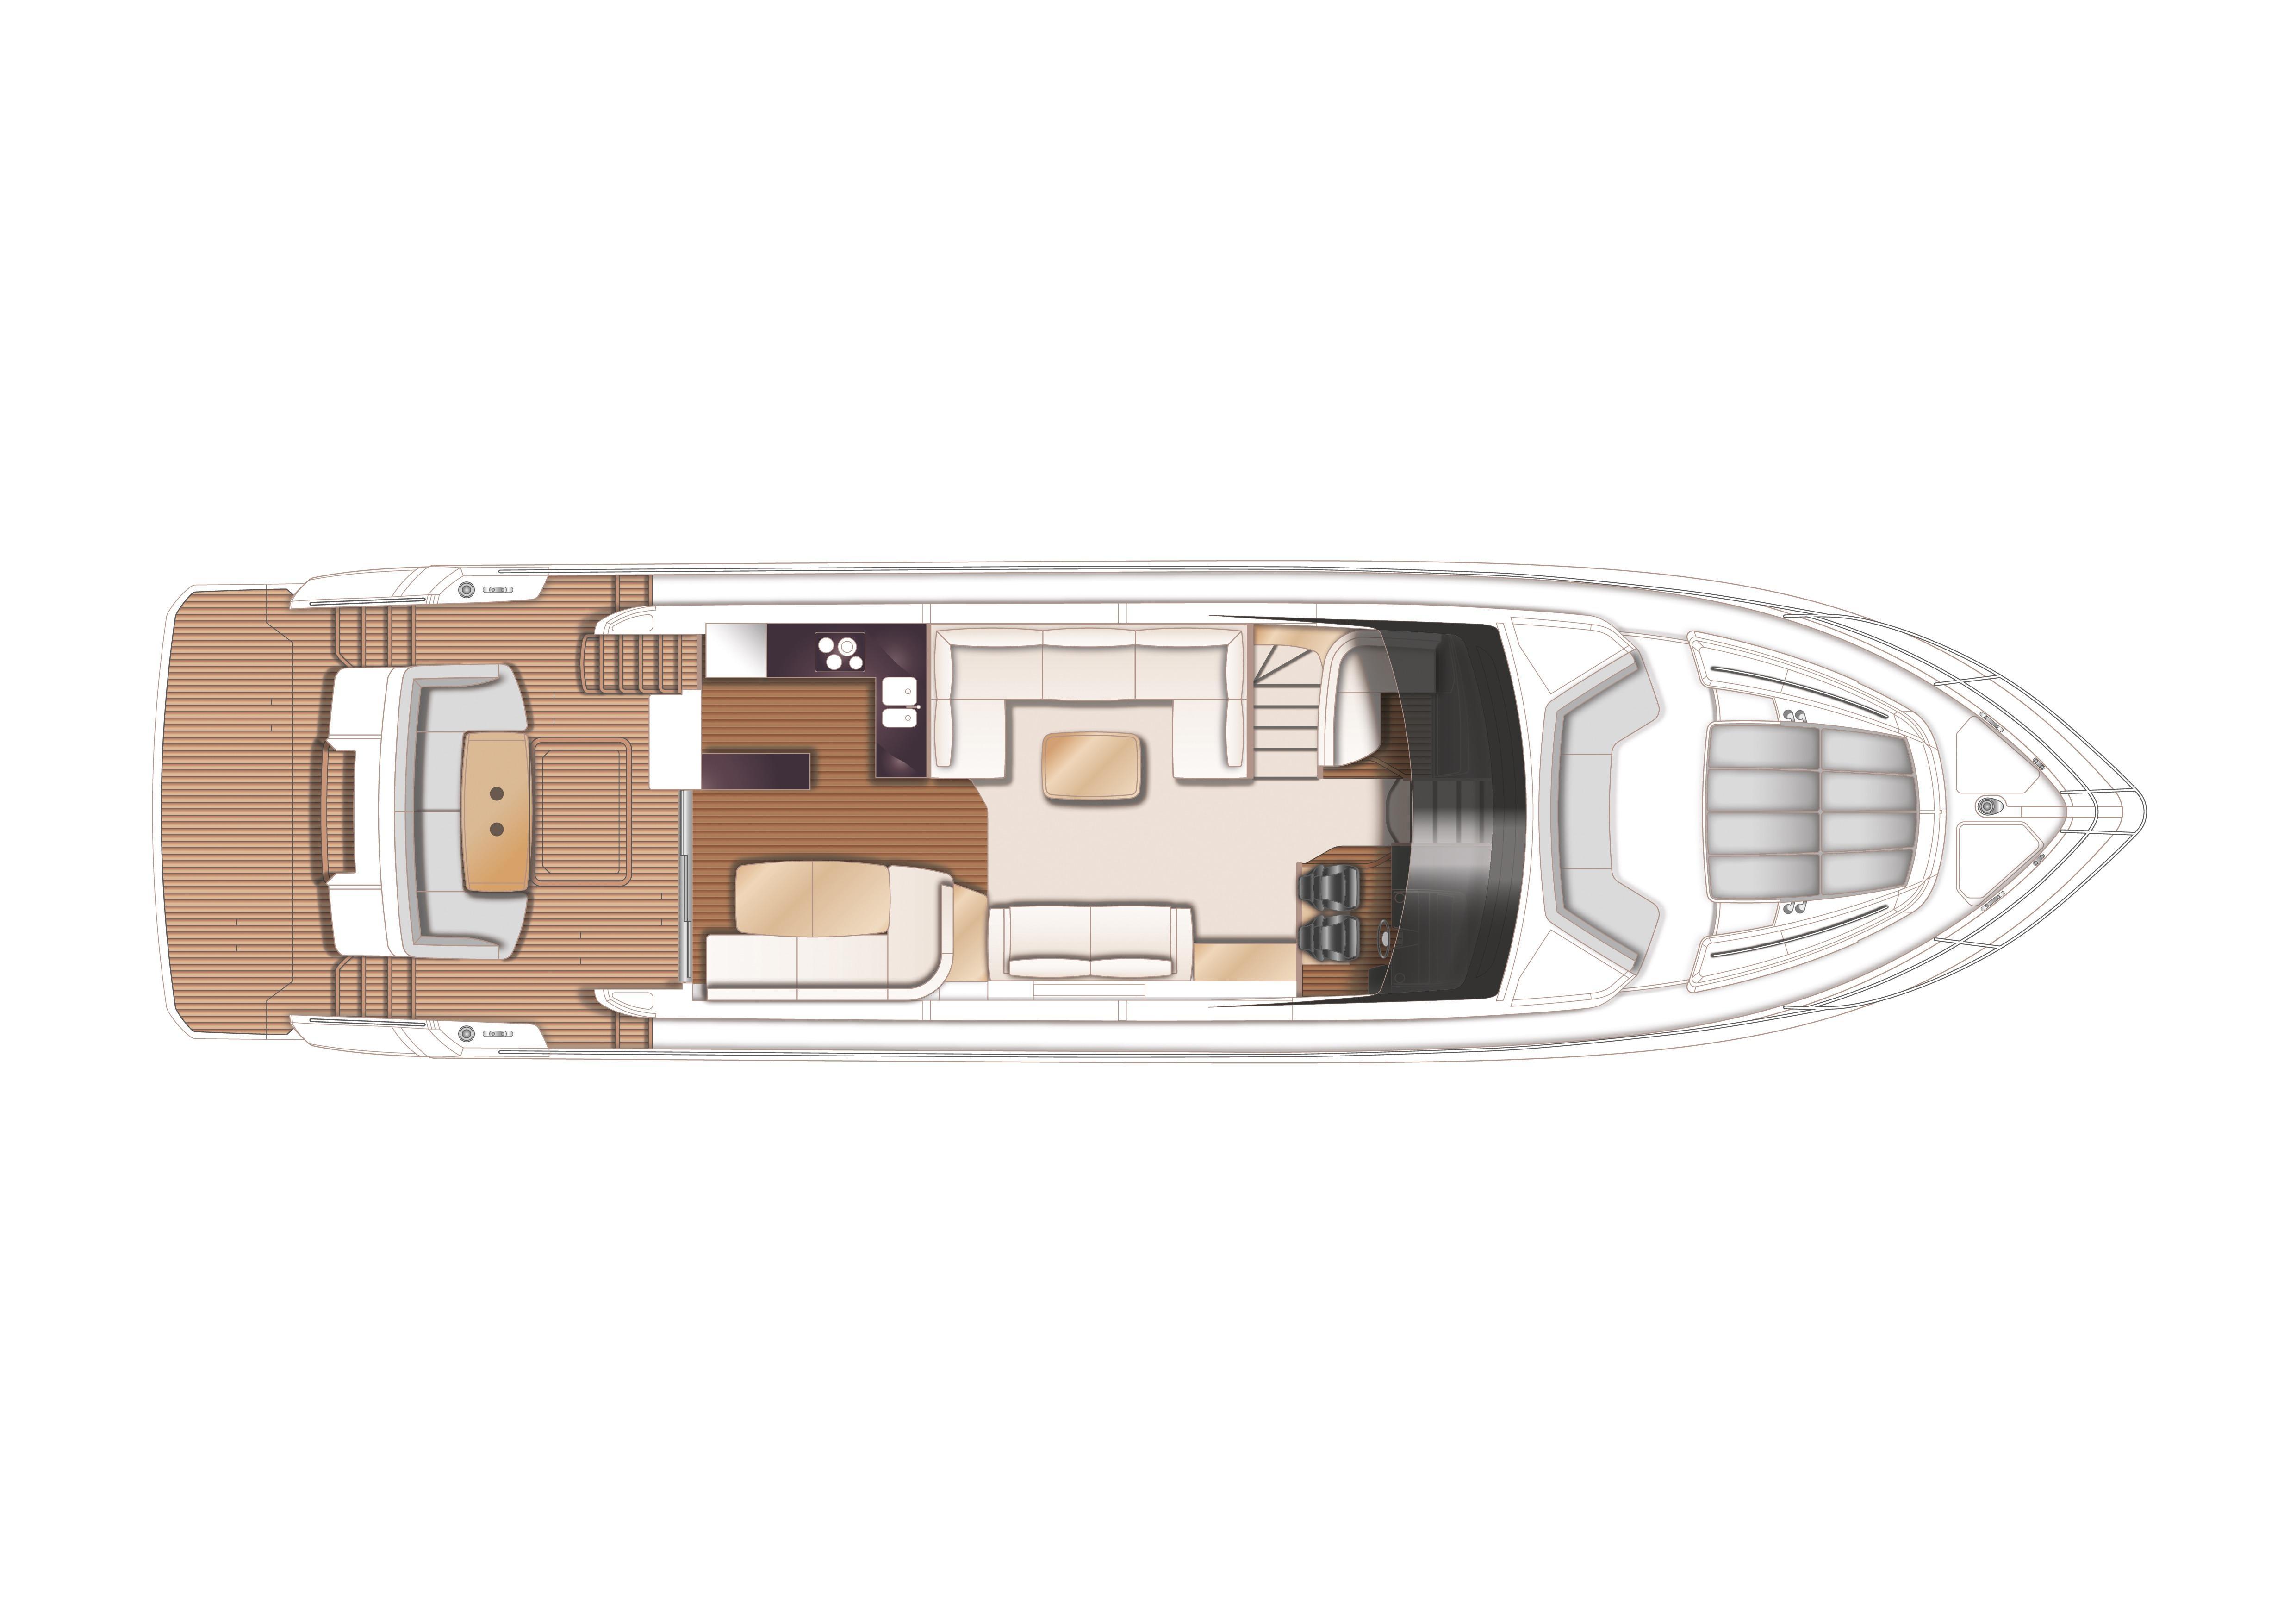 Manufacturer Provided Image: Princess 68 Upper Deck Layout Plan